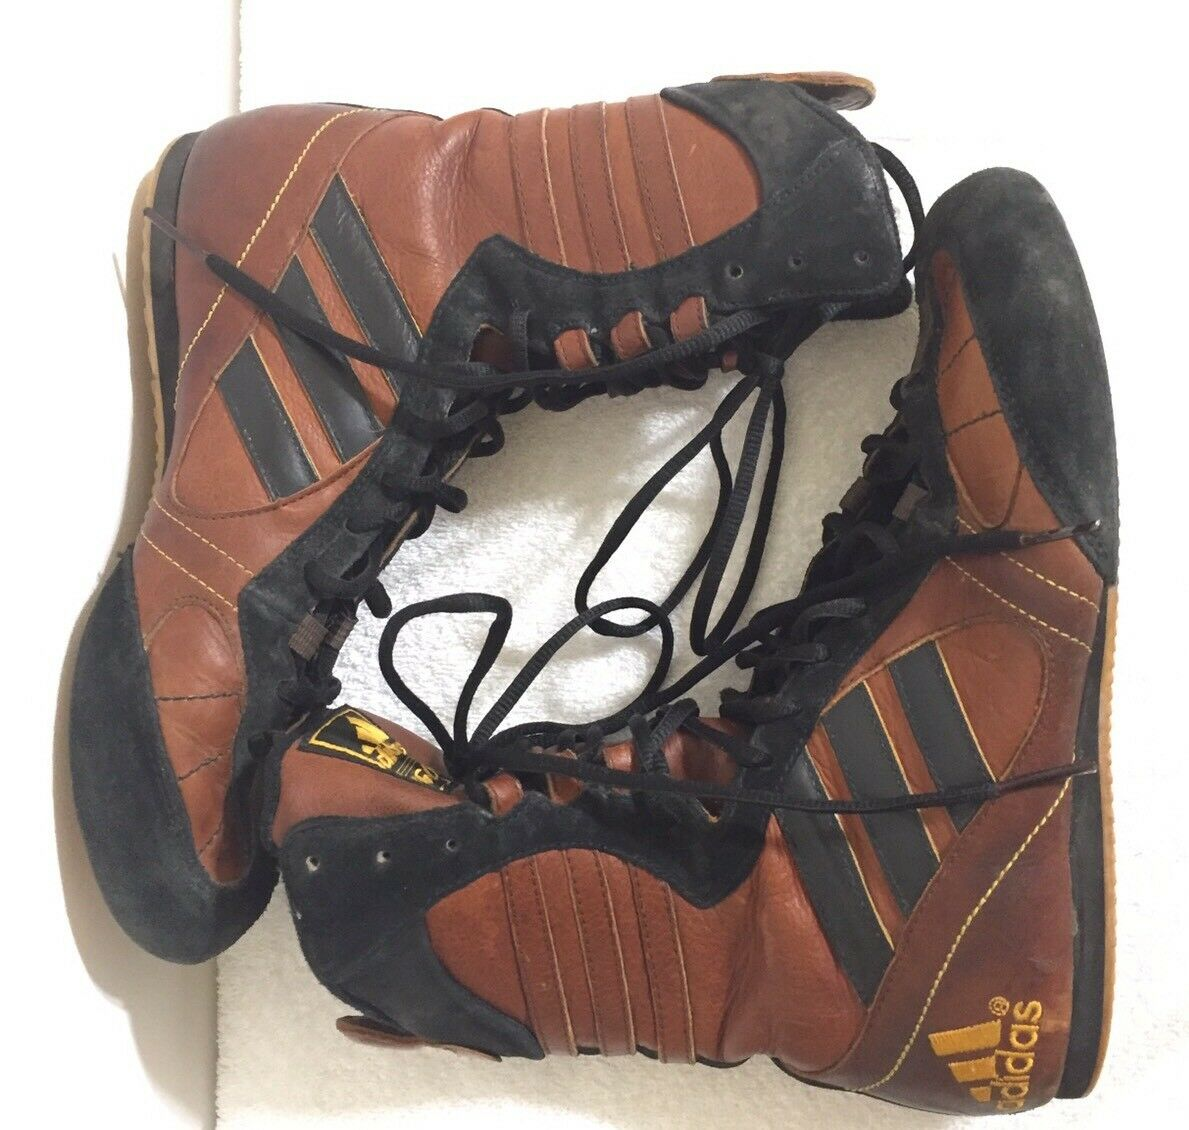 2004 adidas ringen, tygun lederstiefel hi tops boxen, ringen, adidas braune schwarze 5,5 f0b7c2